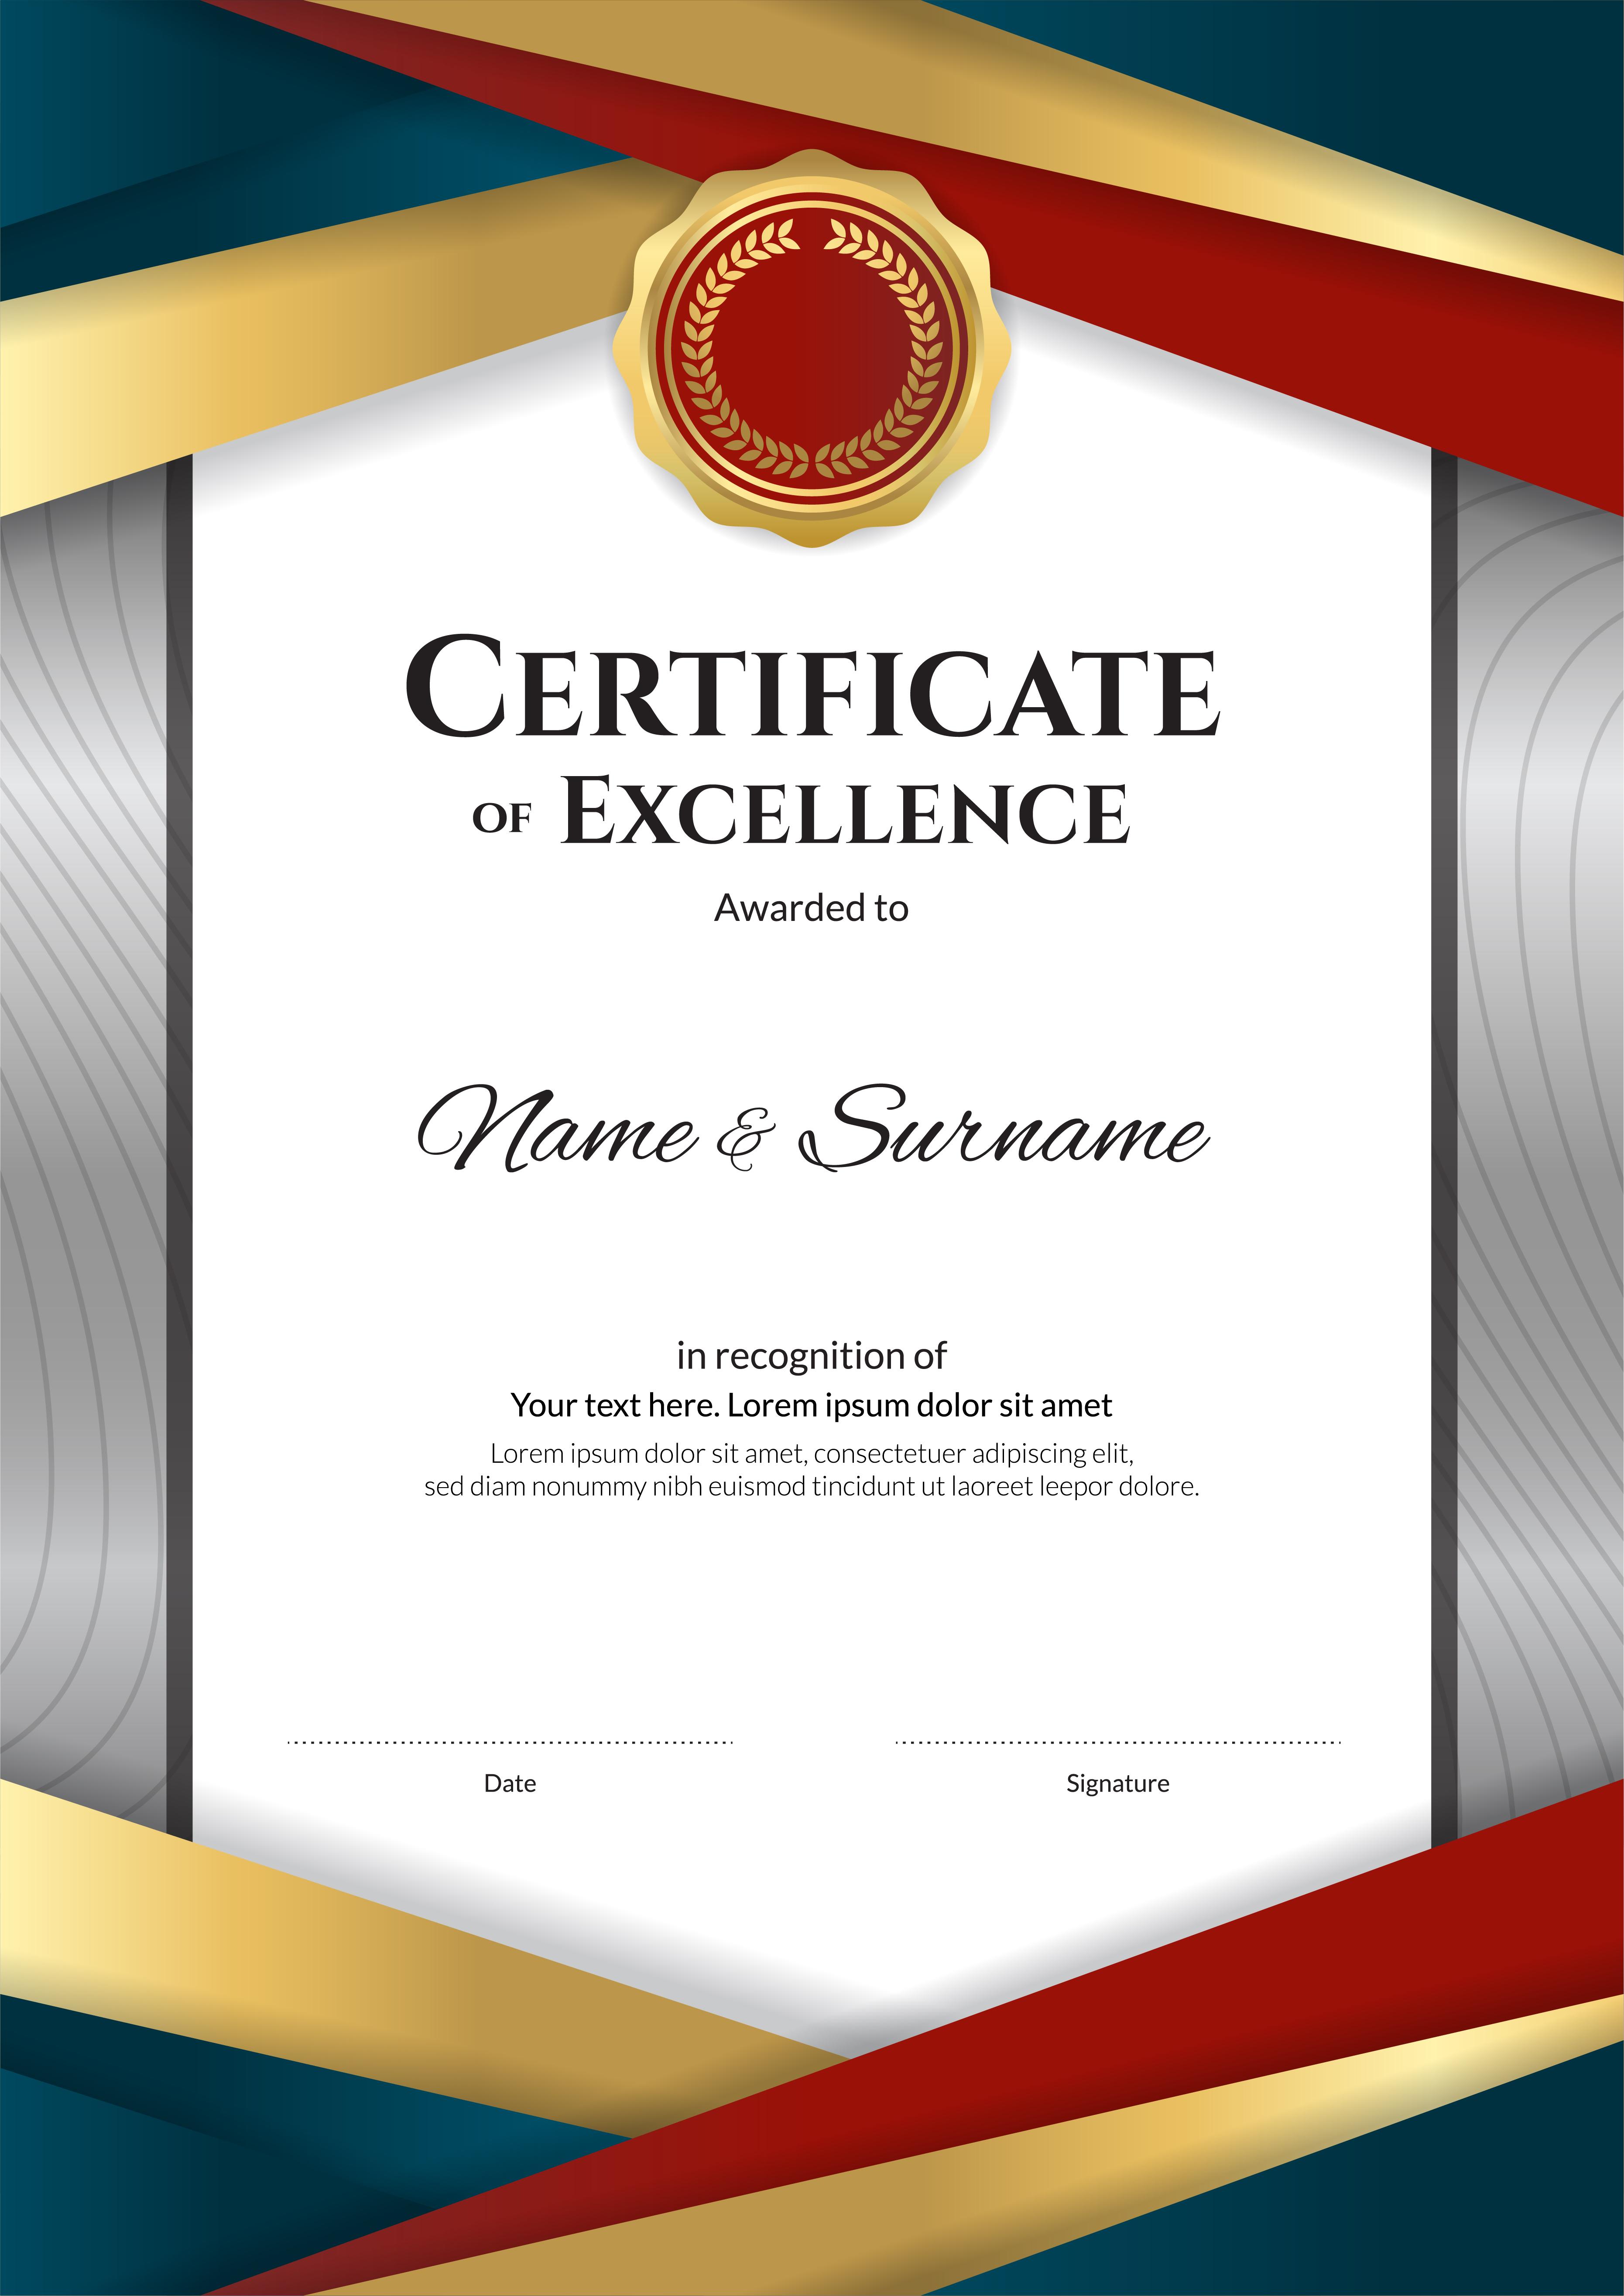 Portrait luxury certificate template with elegant border ...Red Graduation Borders